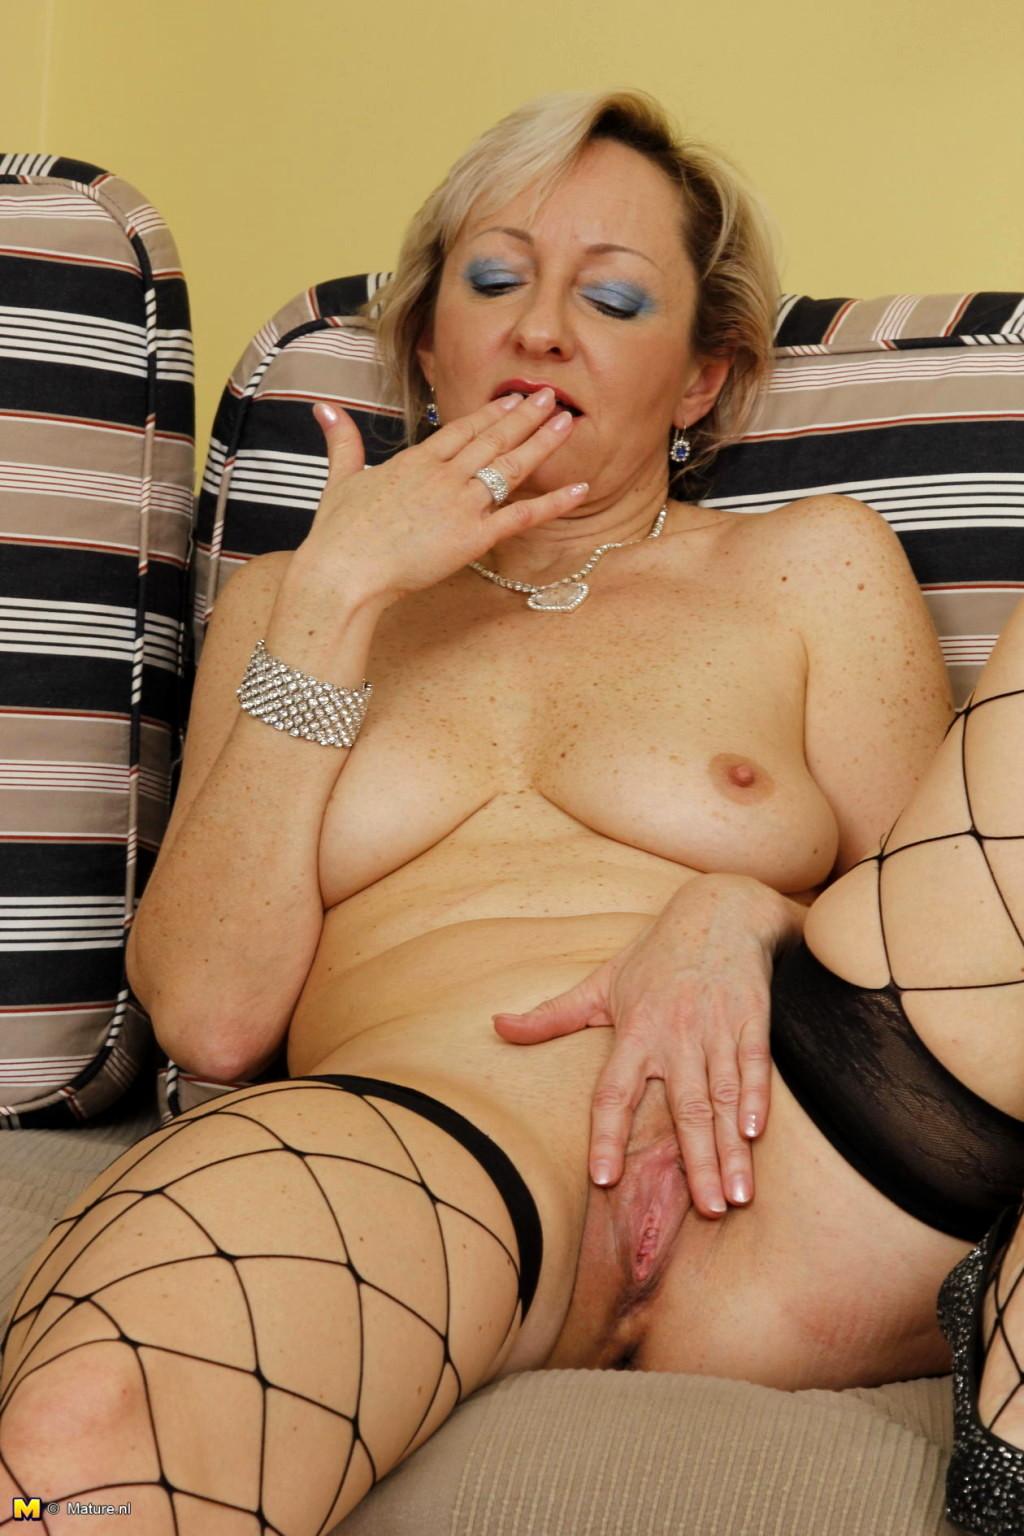 image Blonde beauty nicole aniston pleasures herself